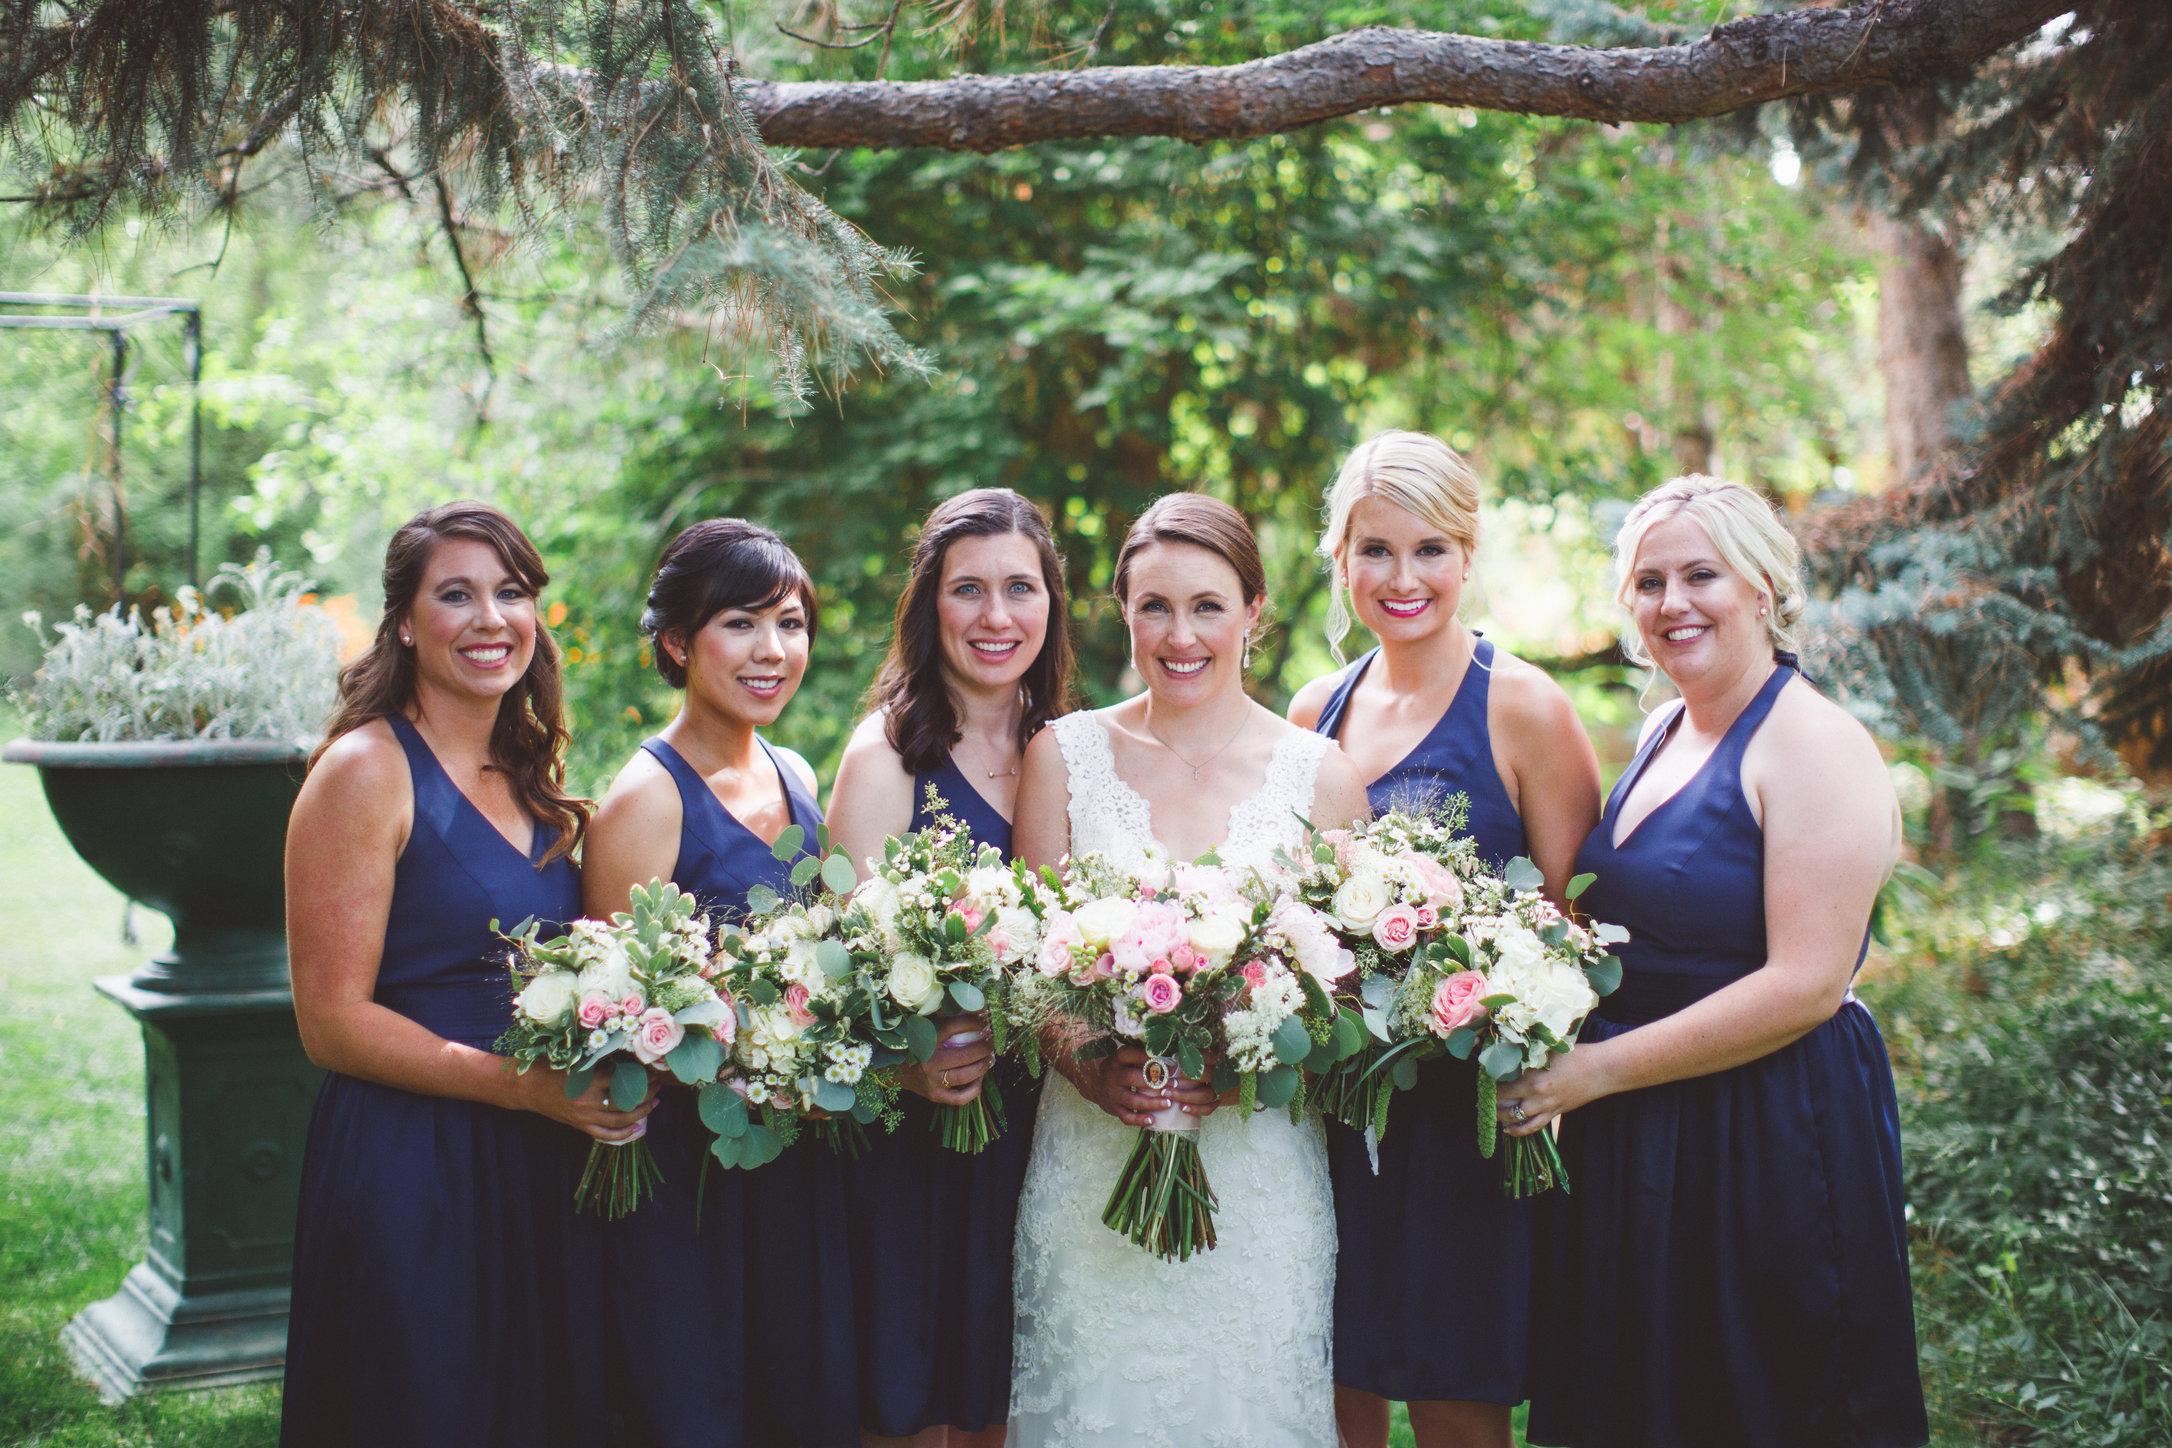 SandC-wedding-373.jpg